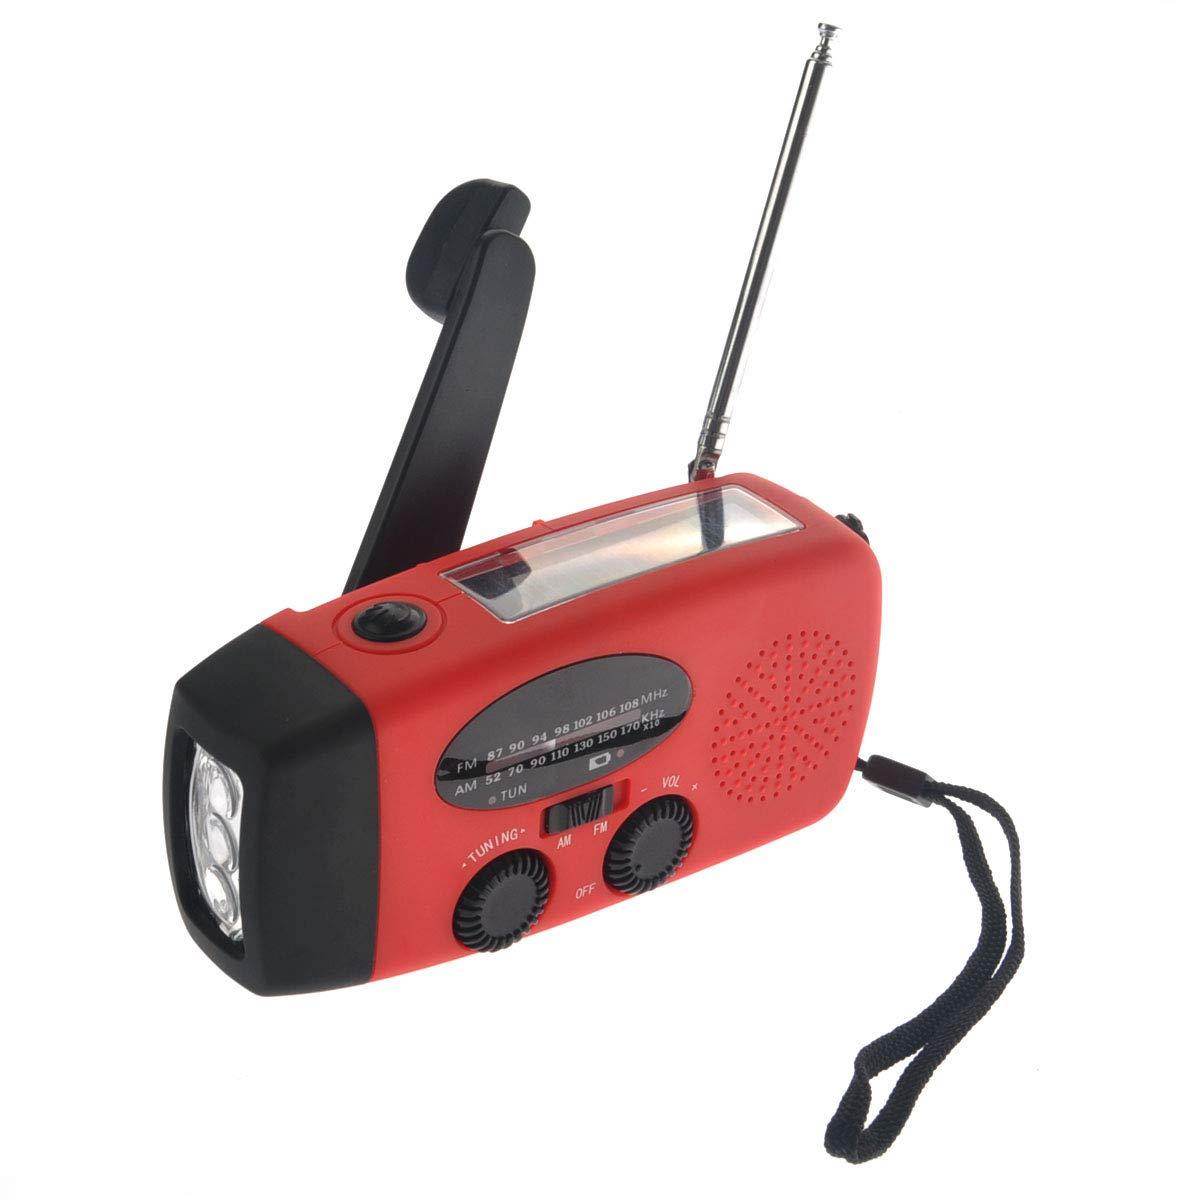 VOSAREA Emergency Solar Crank AM FM Camp Radio with LED Flashlight USB Output Port(Red) by VOSAREA (Image #2)